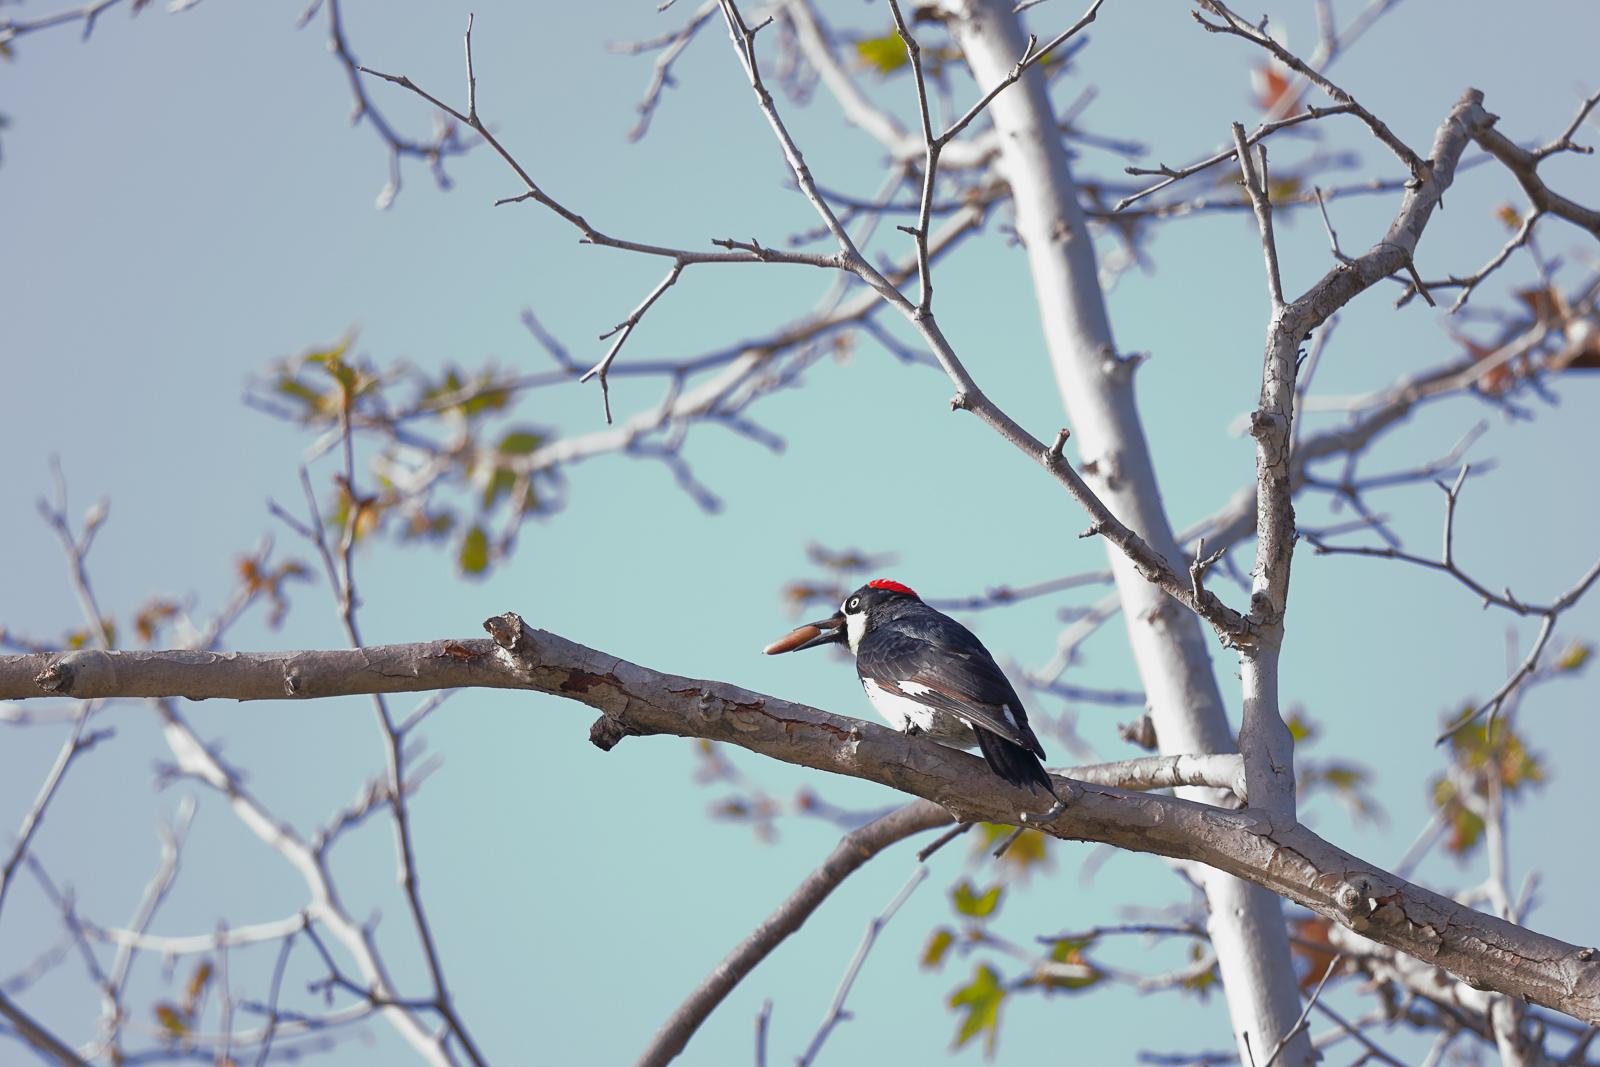 20180326-Acorn Woodpecker Santee Lakes dpp.jpg